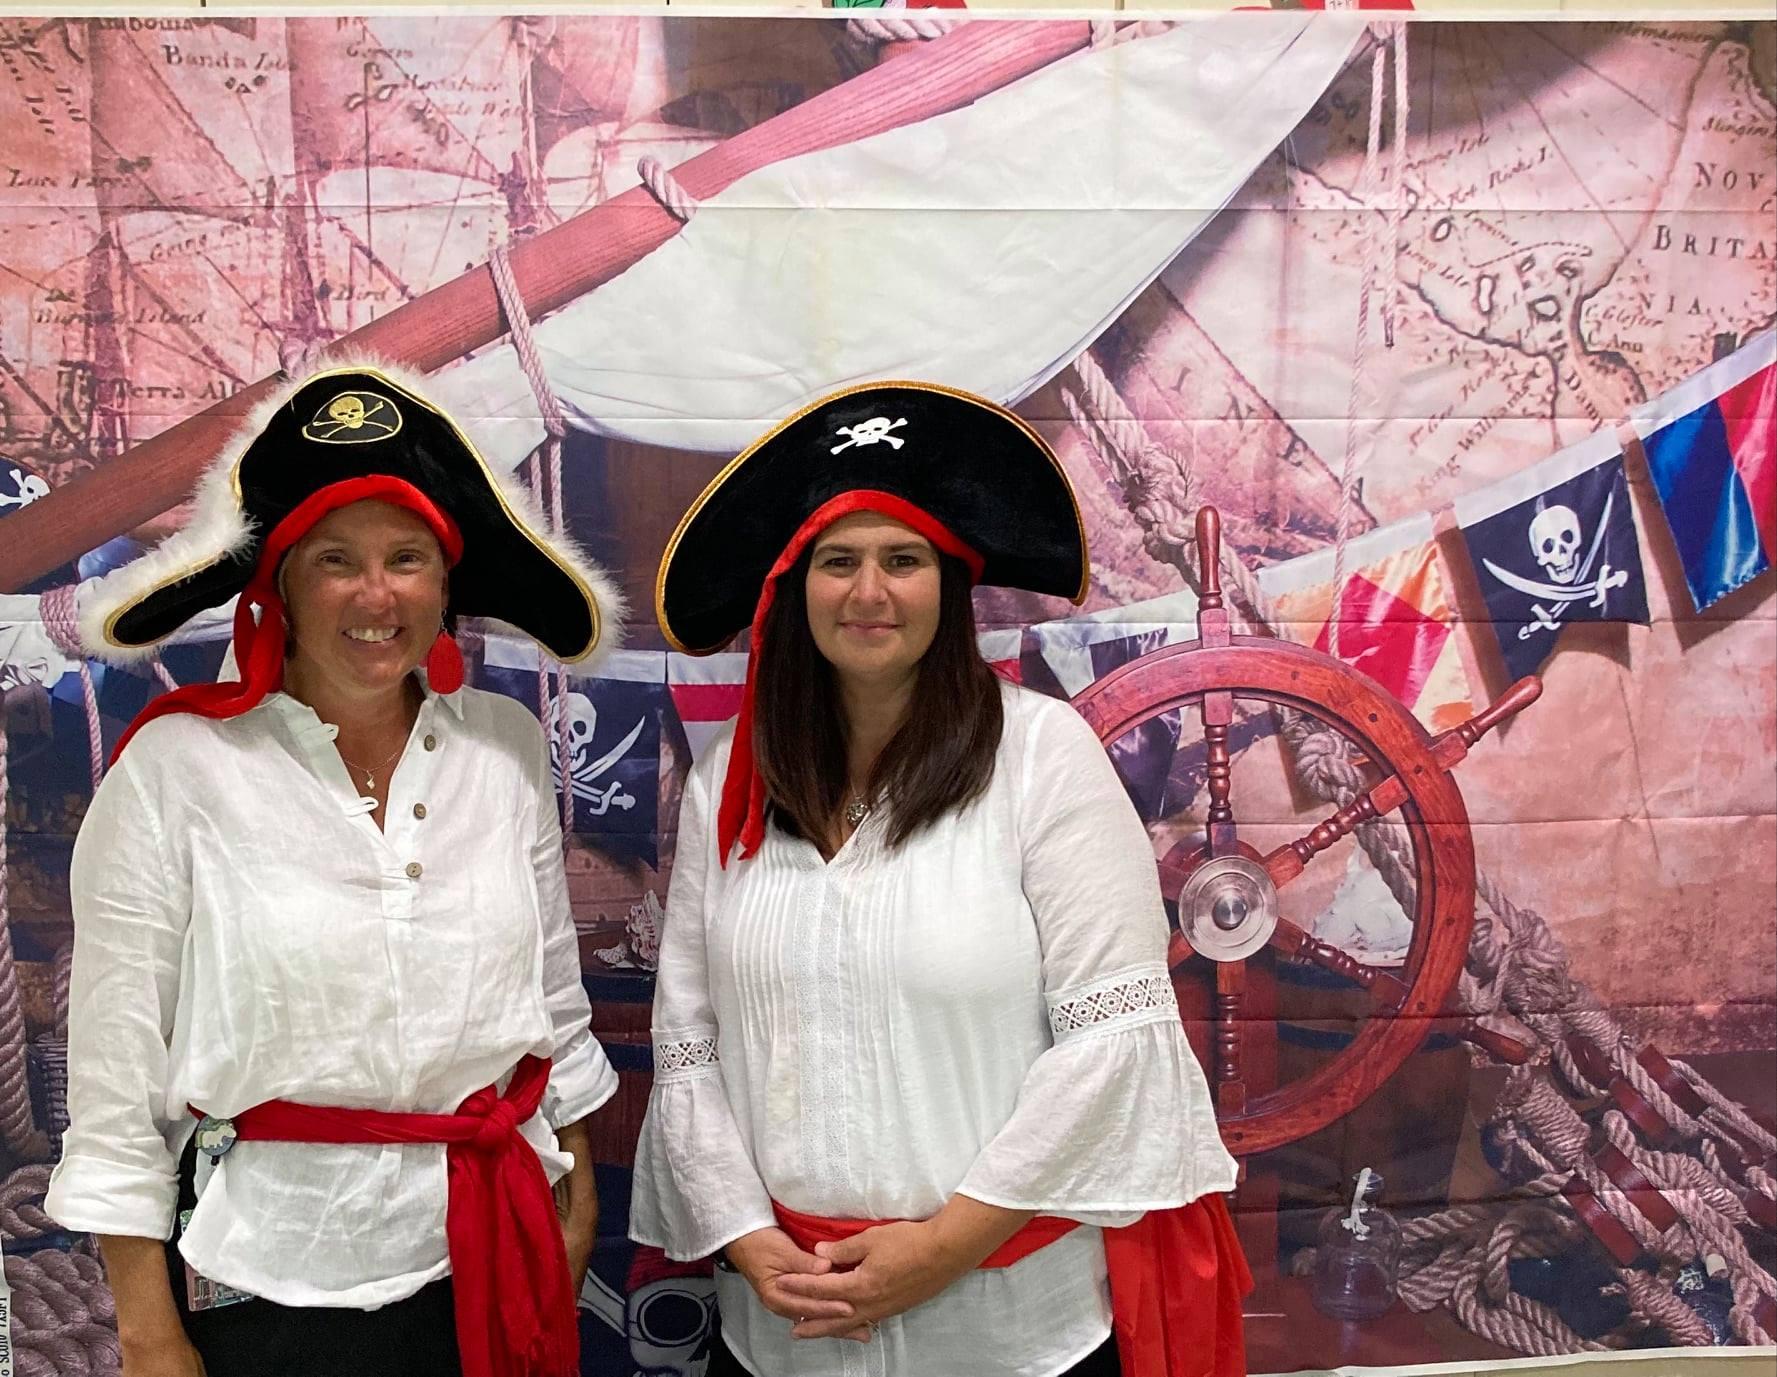 Pirate Teachers